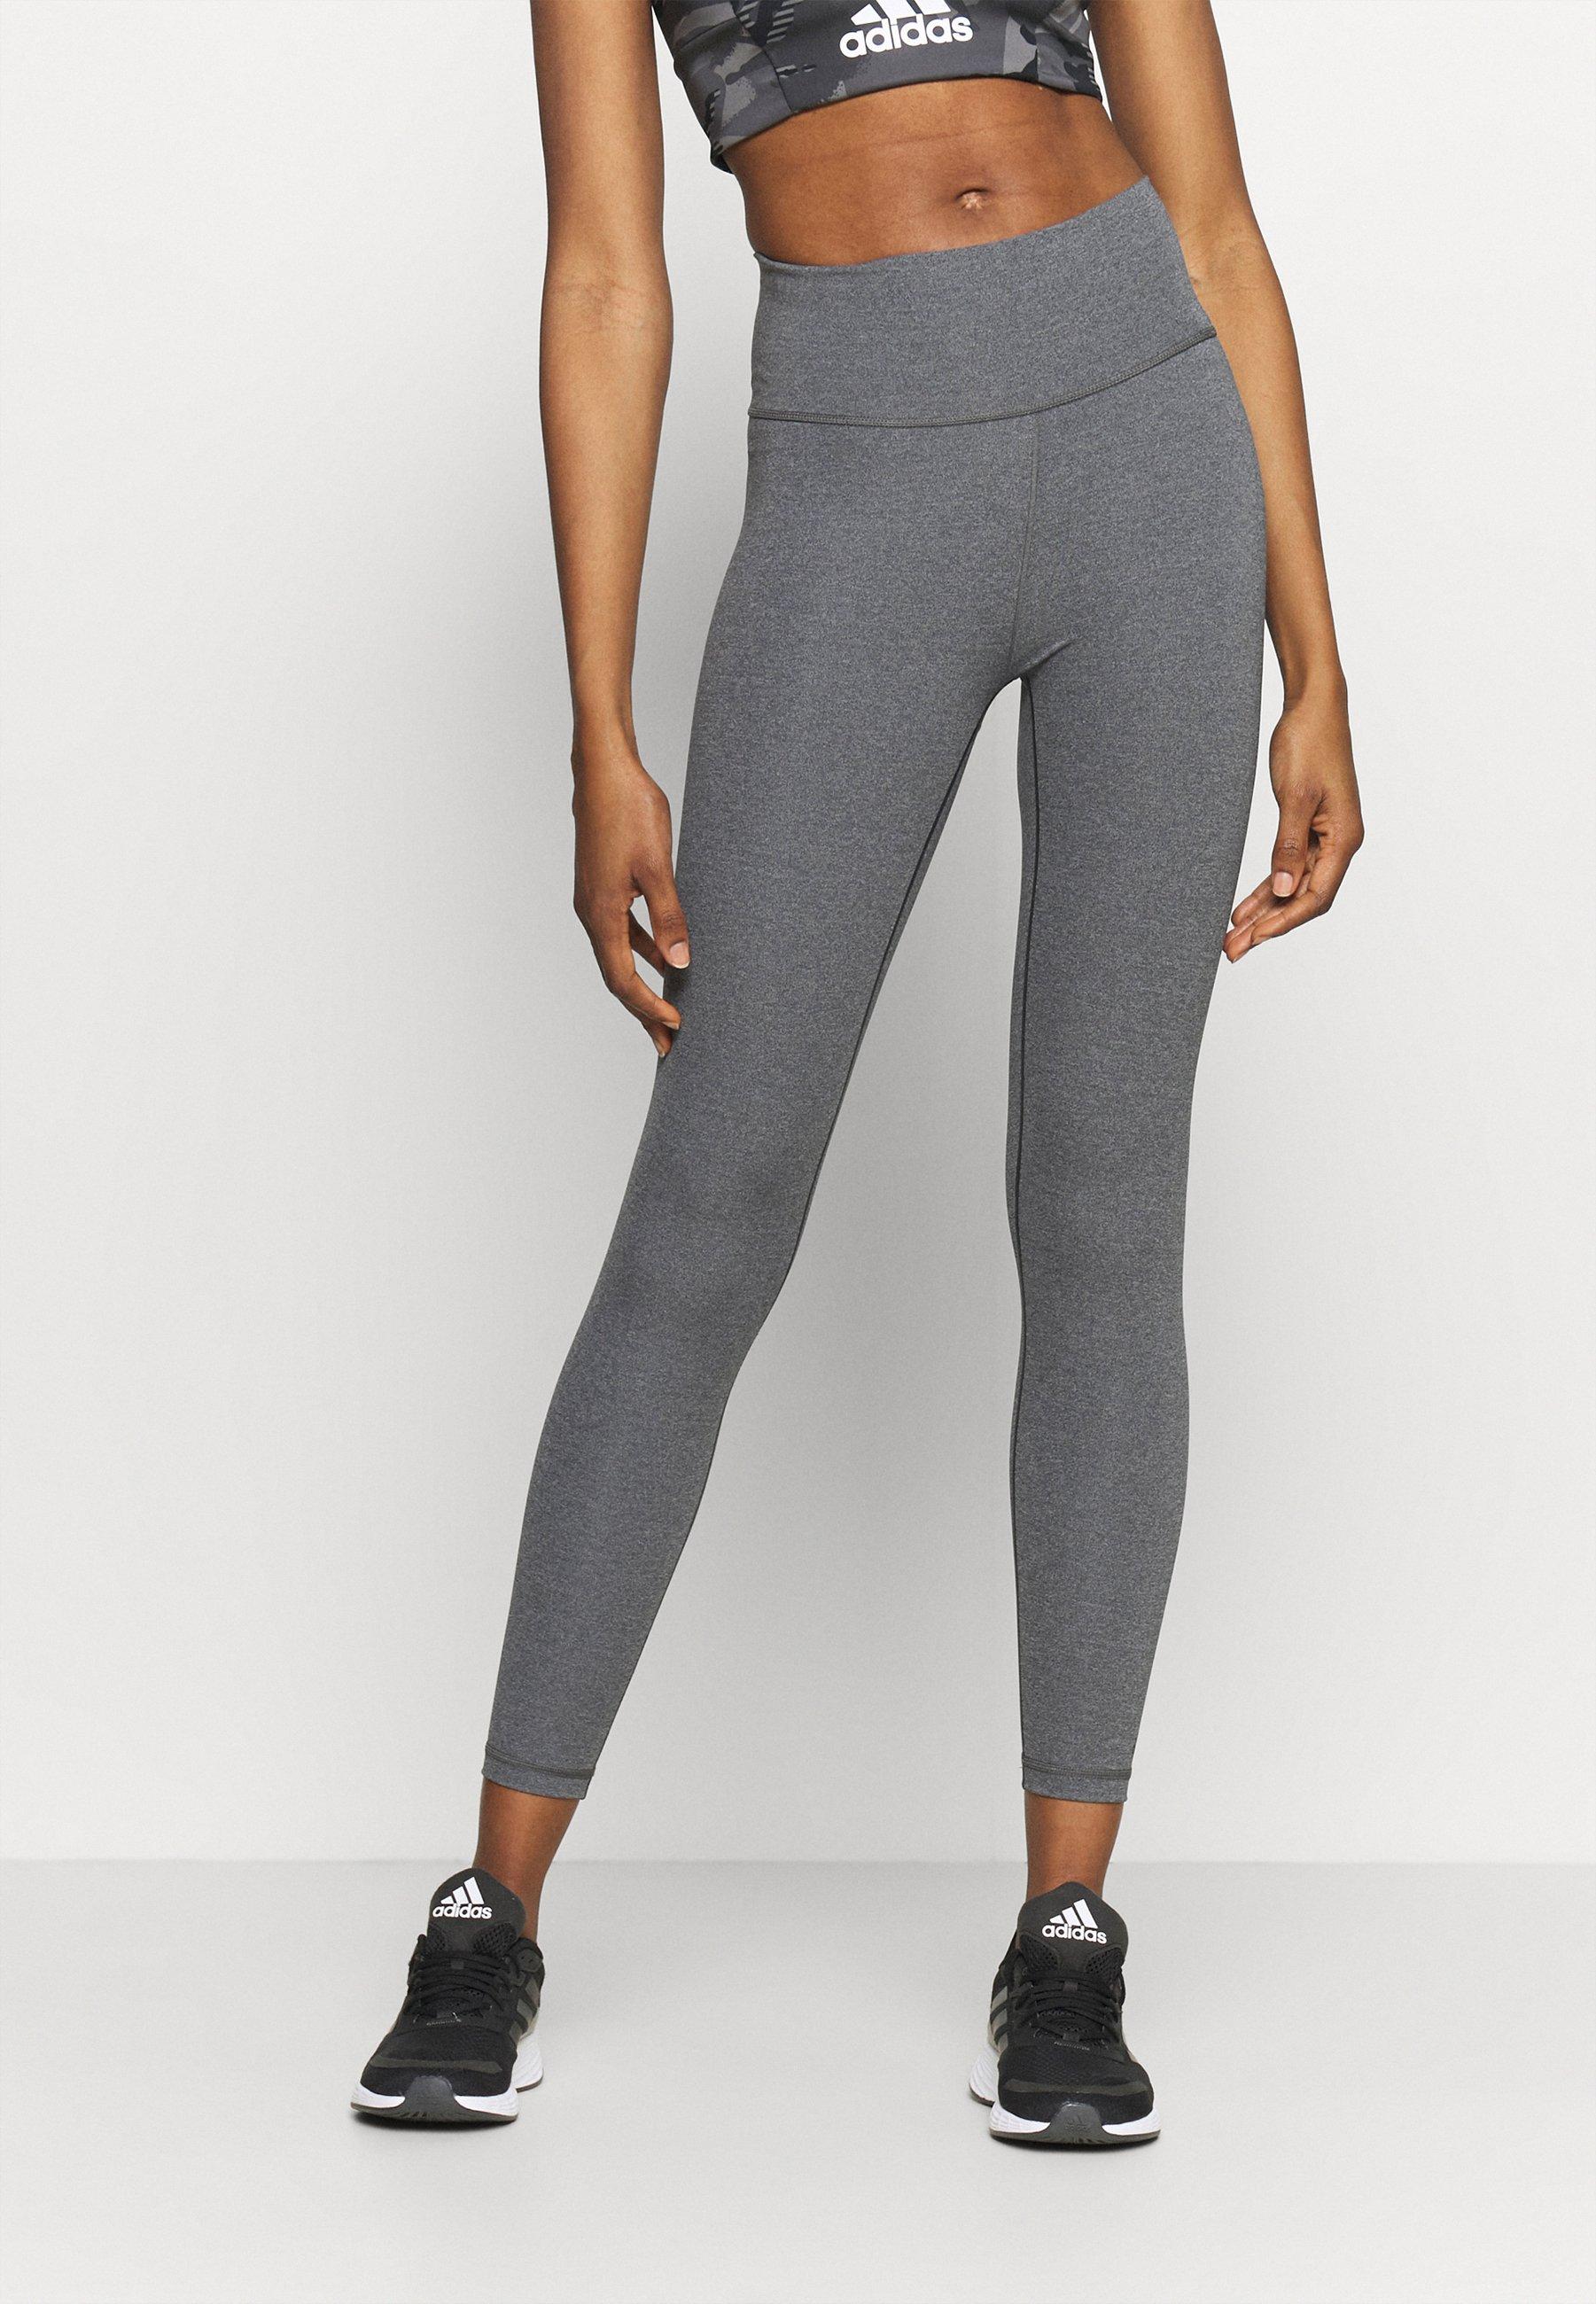 Femme BELIEVE THIS 2.0 AEROREADY SPORTS COMPRESSION LEGGINGS - Collants